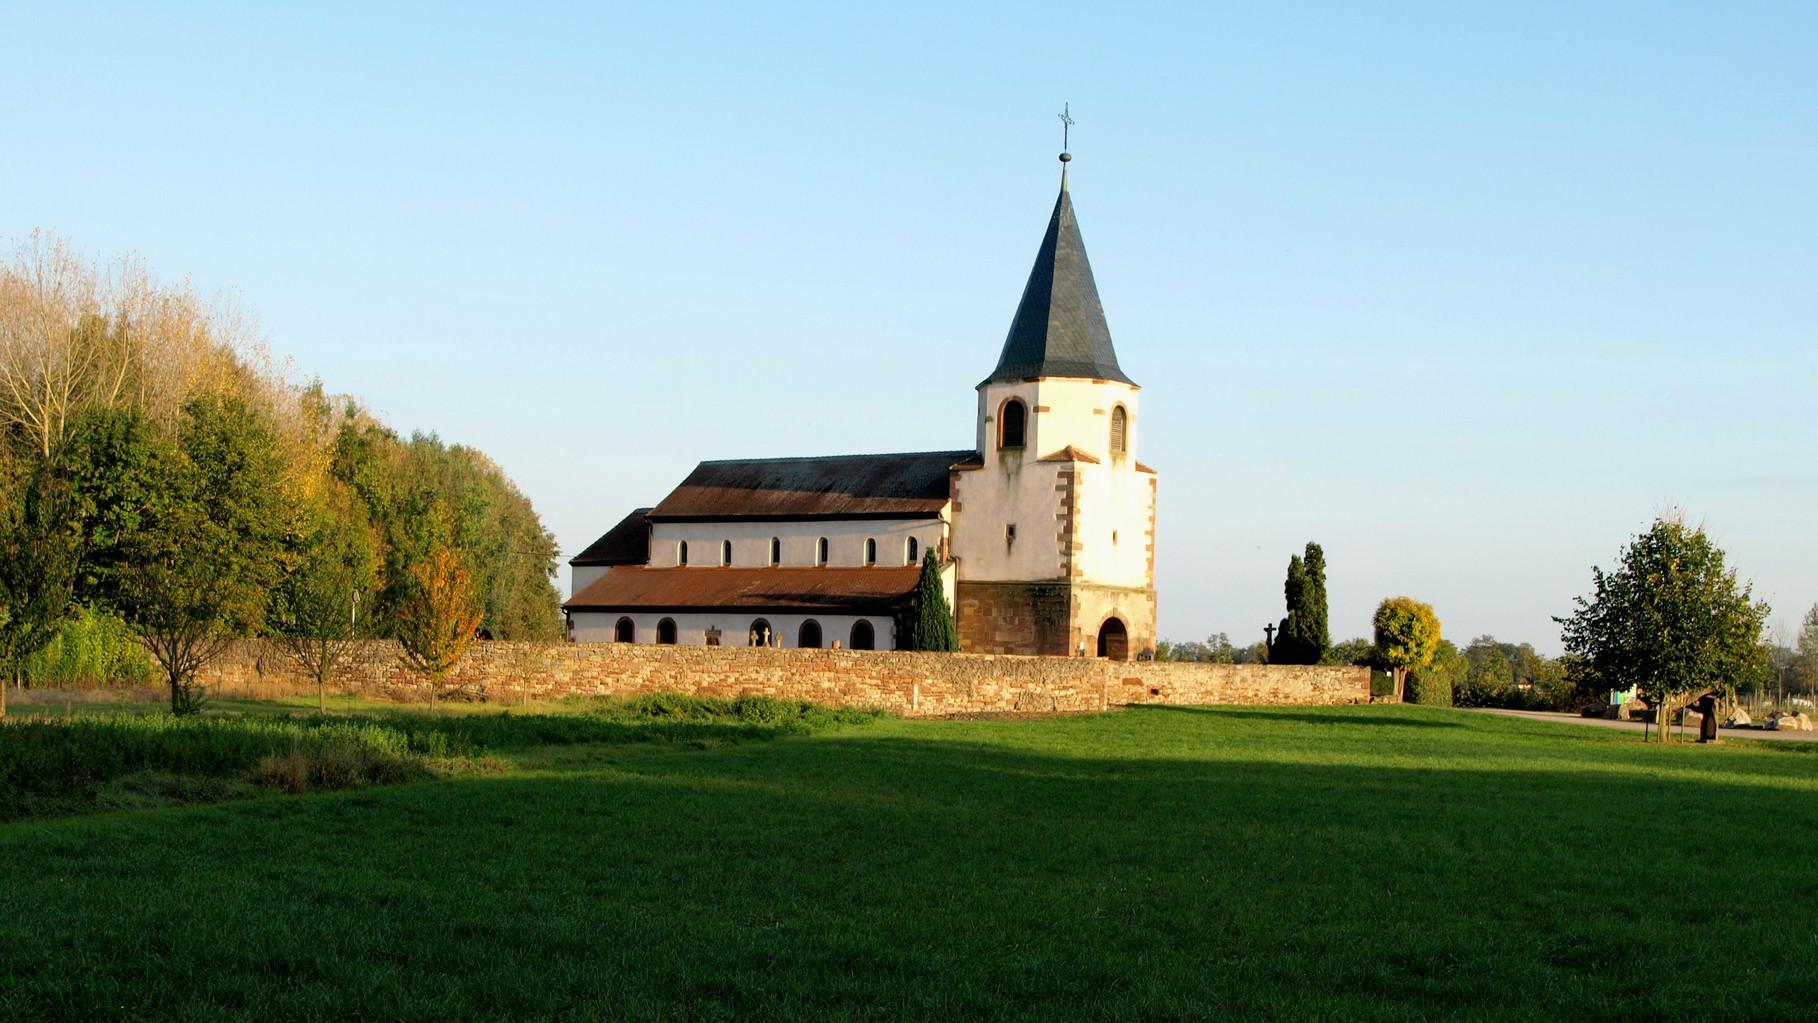 Avolsheim - Dompeter